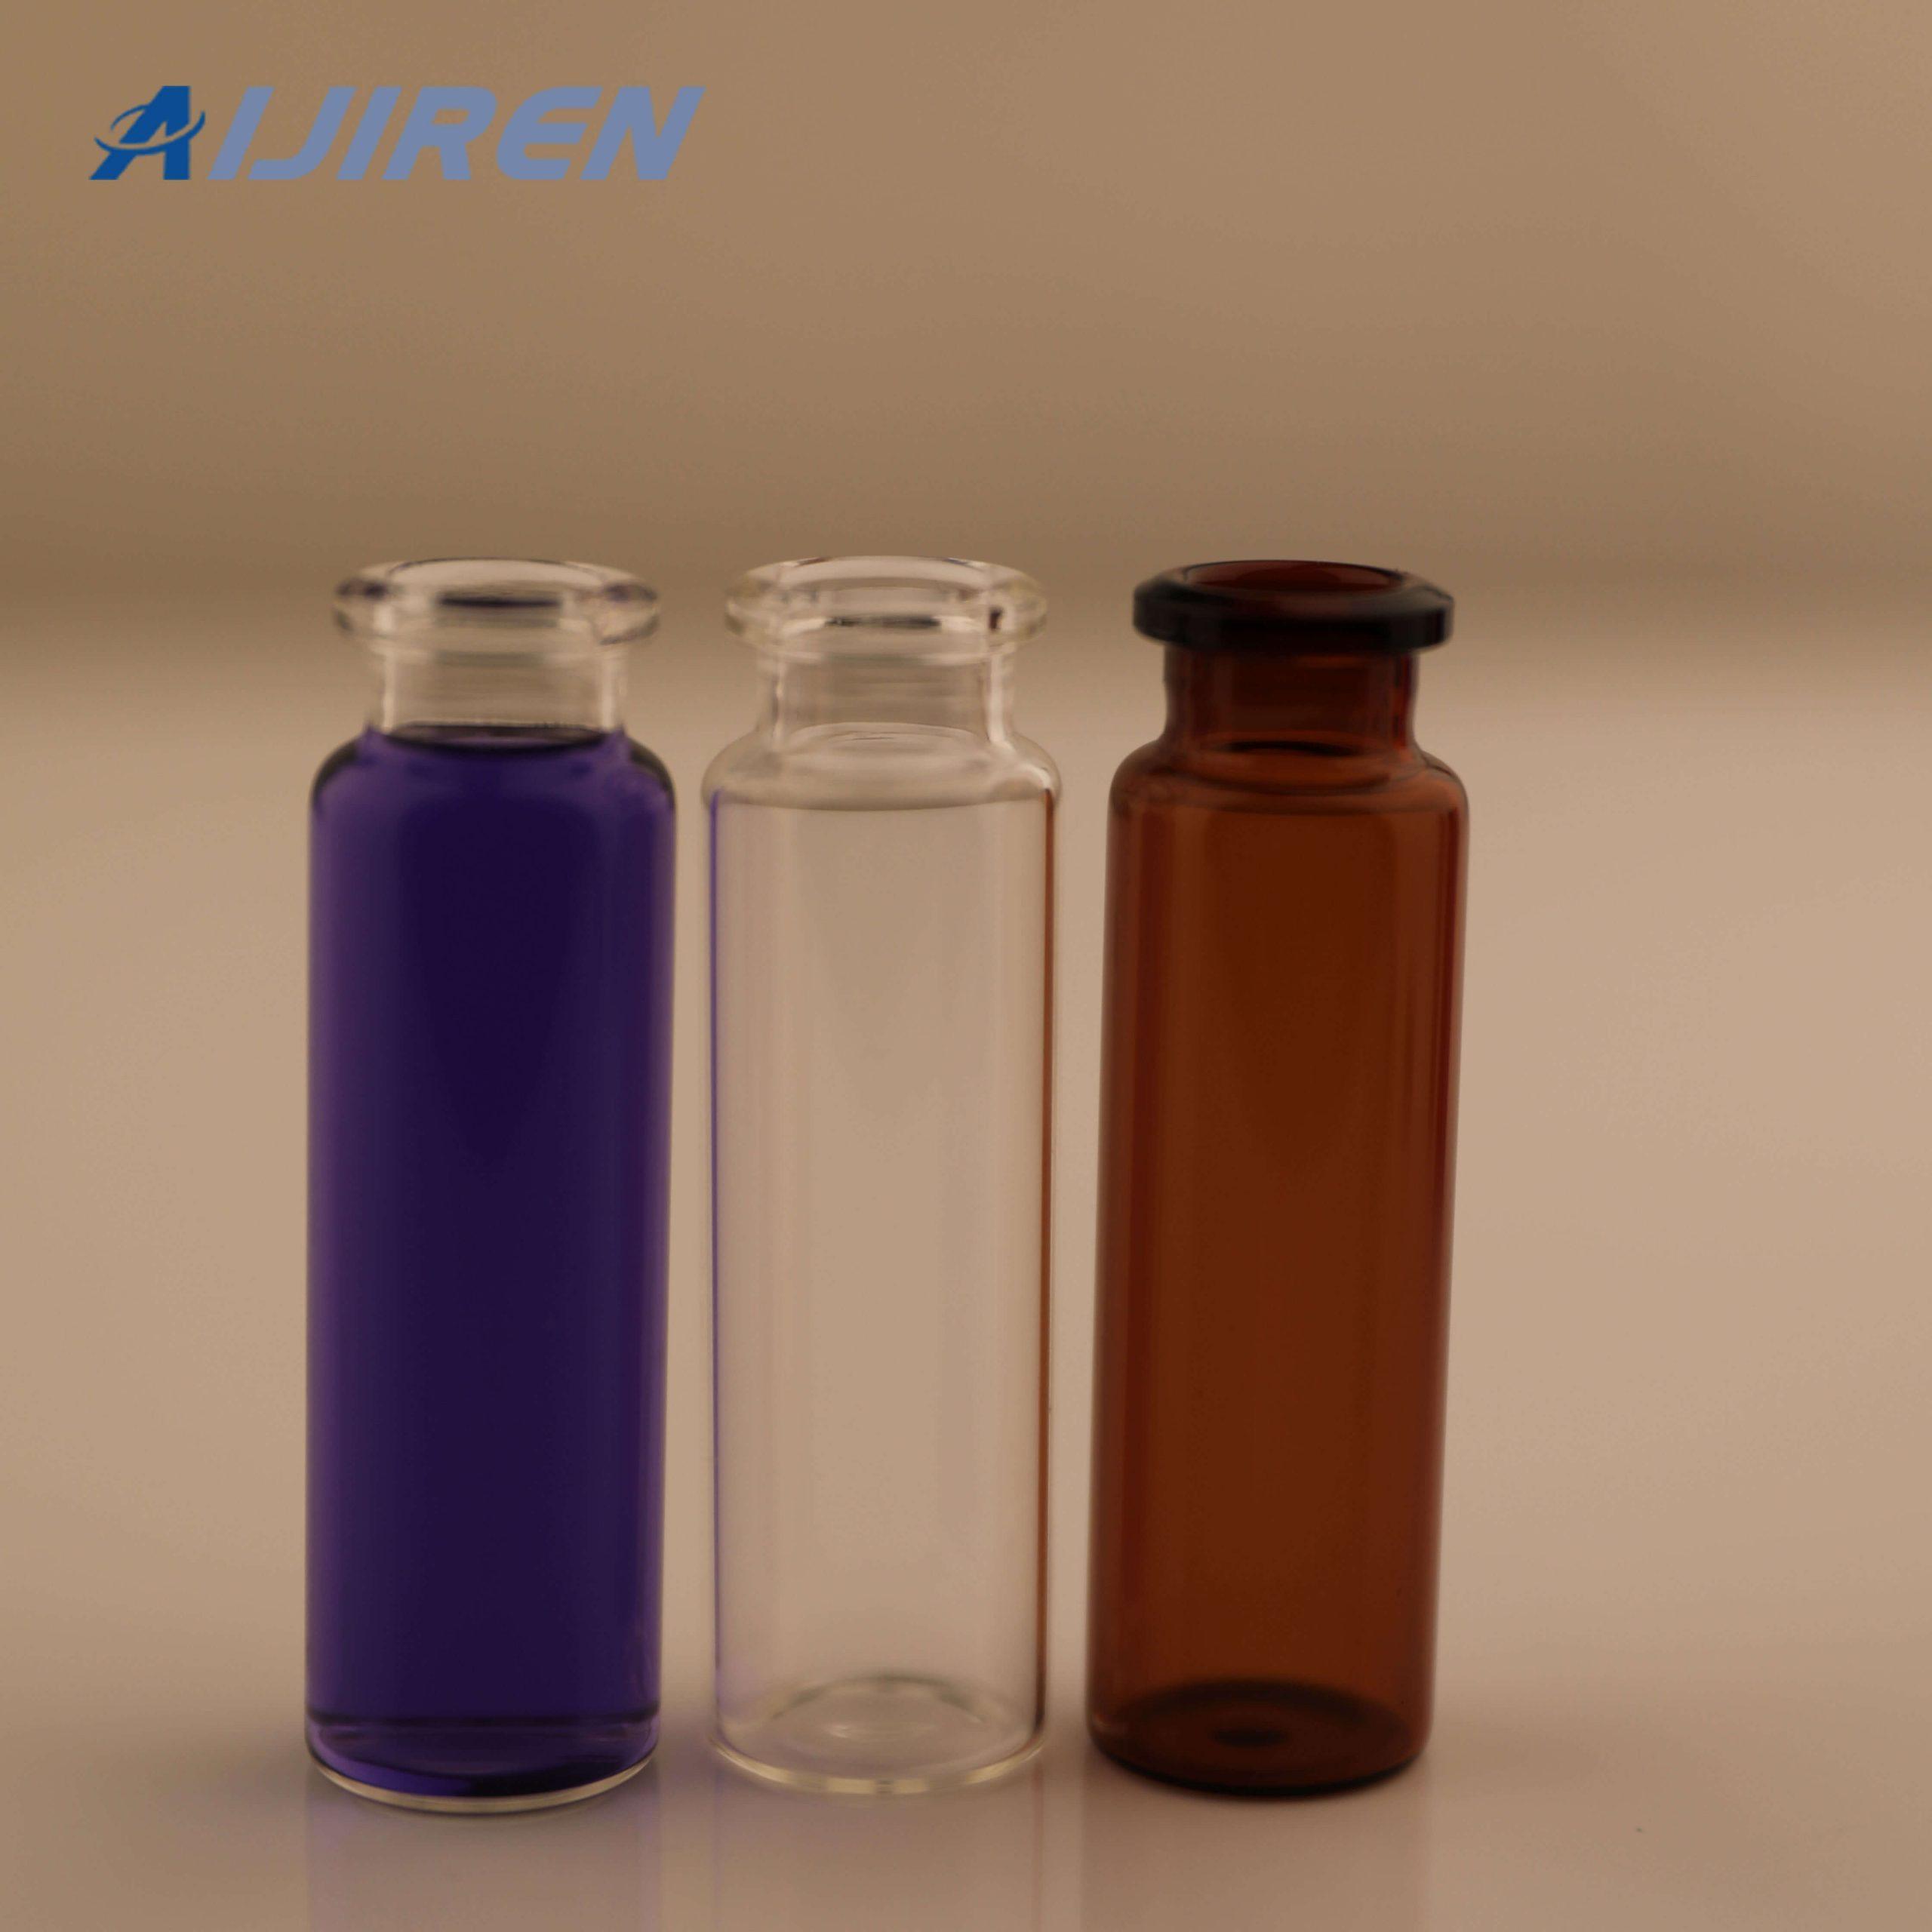 20mm Crimp Top GC Vials for Agilent